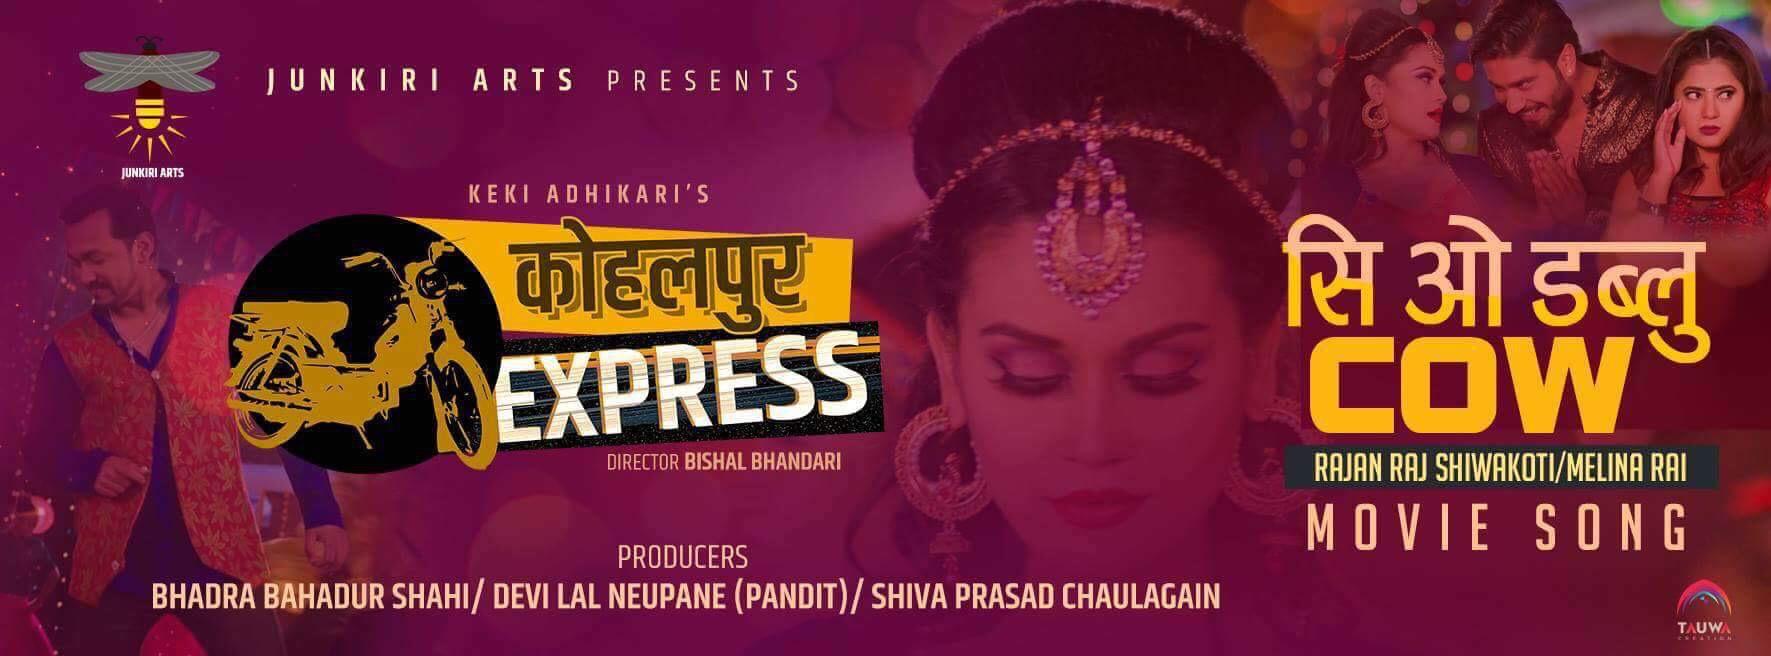 चर्चित नायिका केकी अधिकारीको चलचित्र 'कोहलपुर एक्सप्रेस'को C O W सार्वजानिक